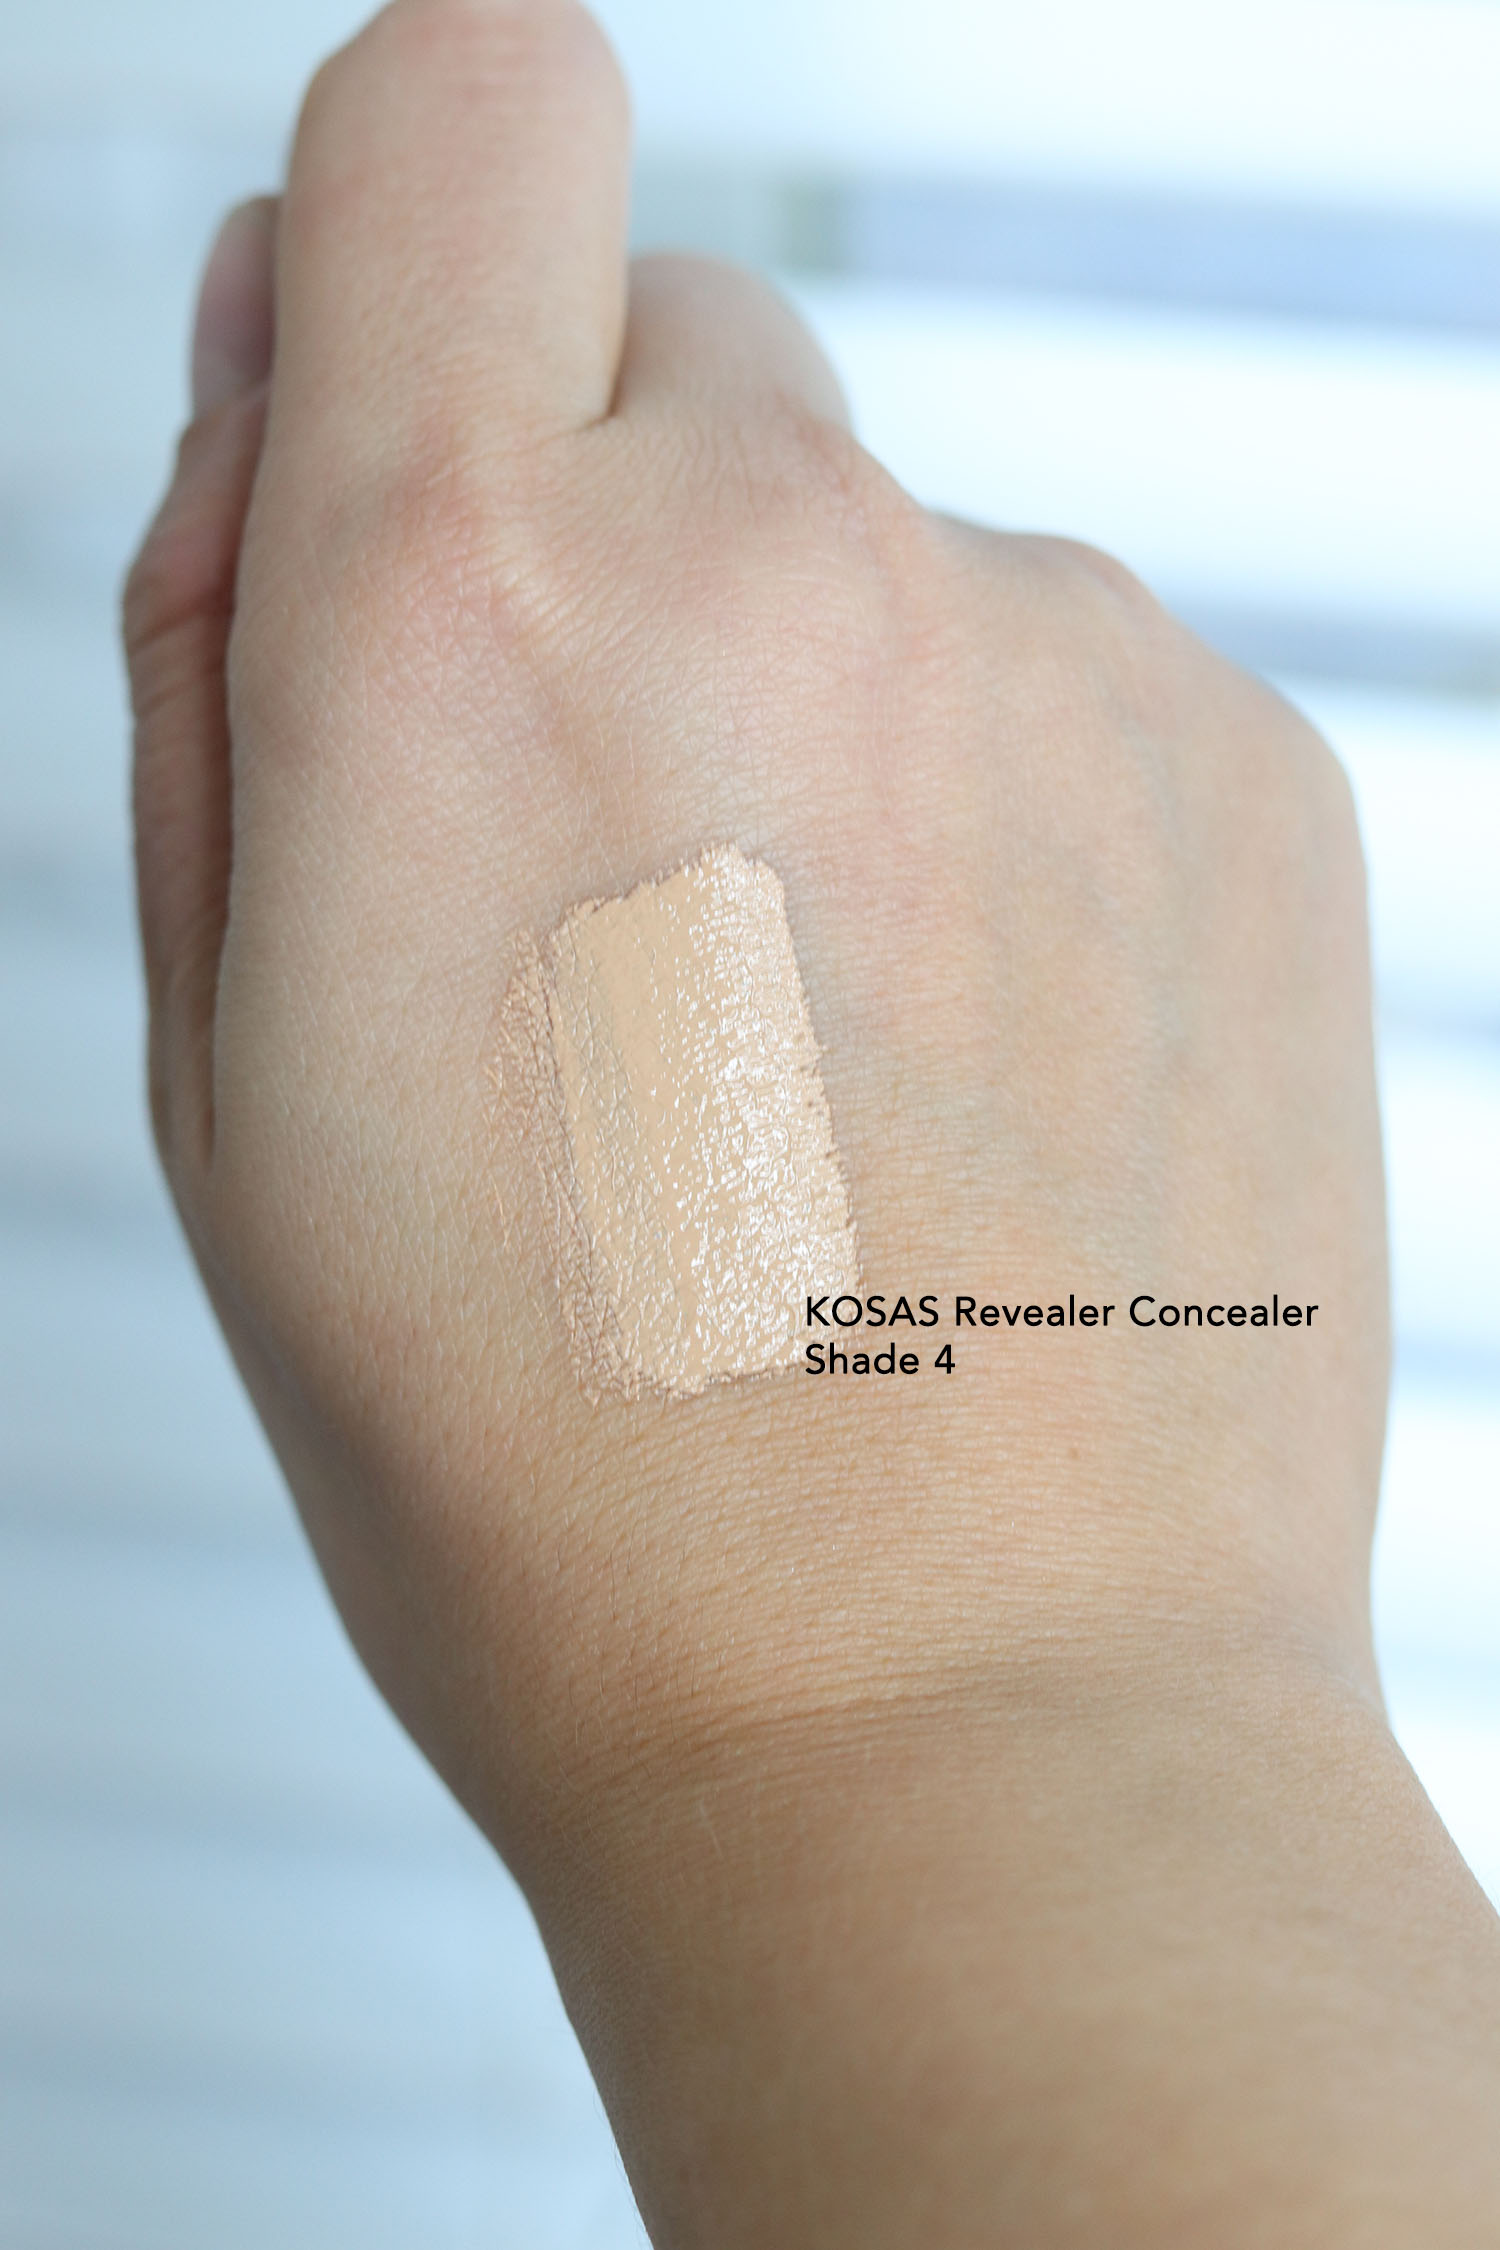 KOSAS Revealer Concealer Shade 4 Swatch